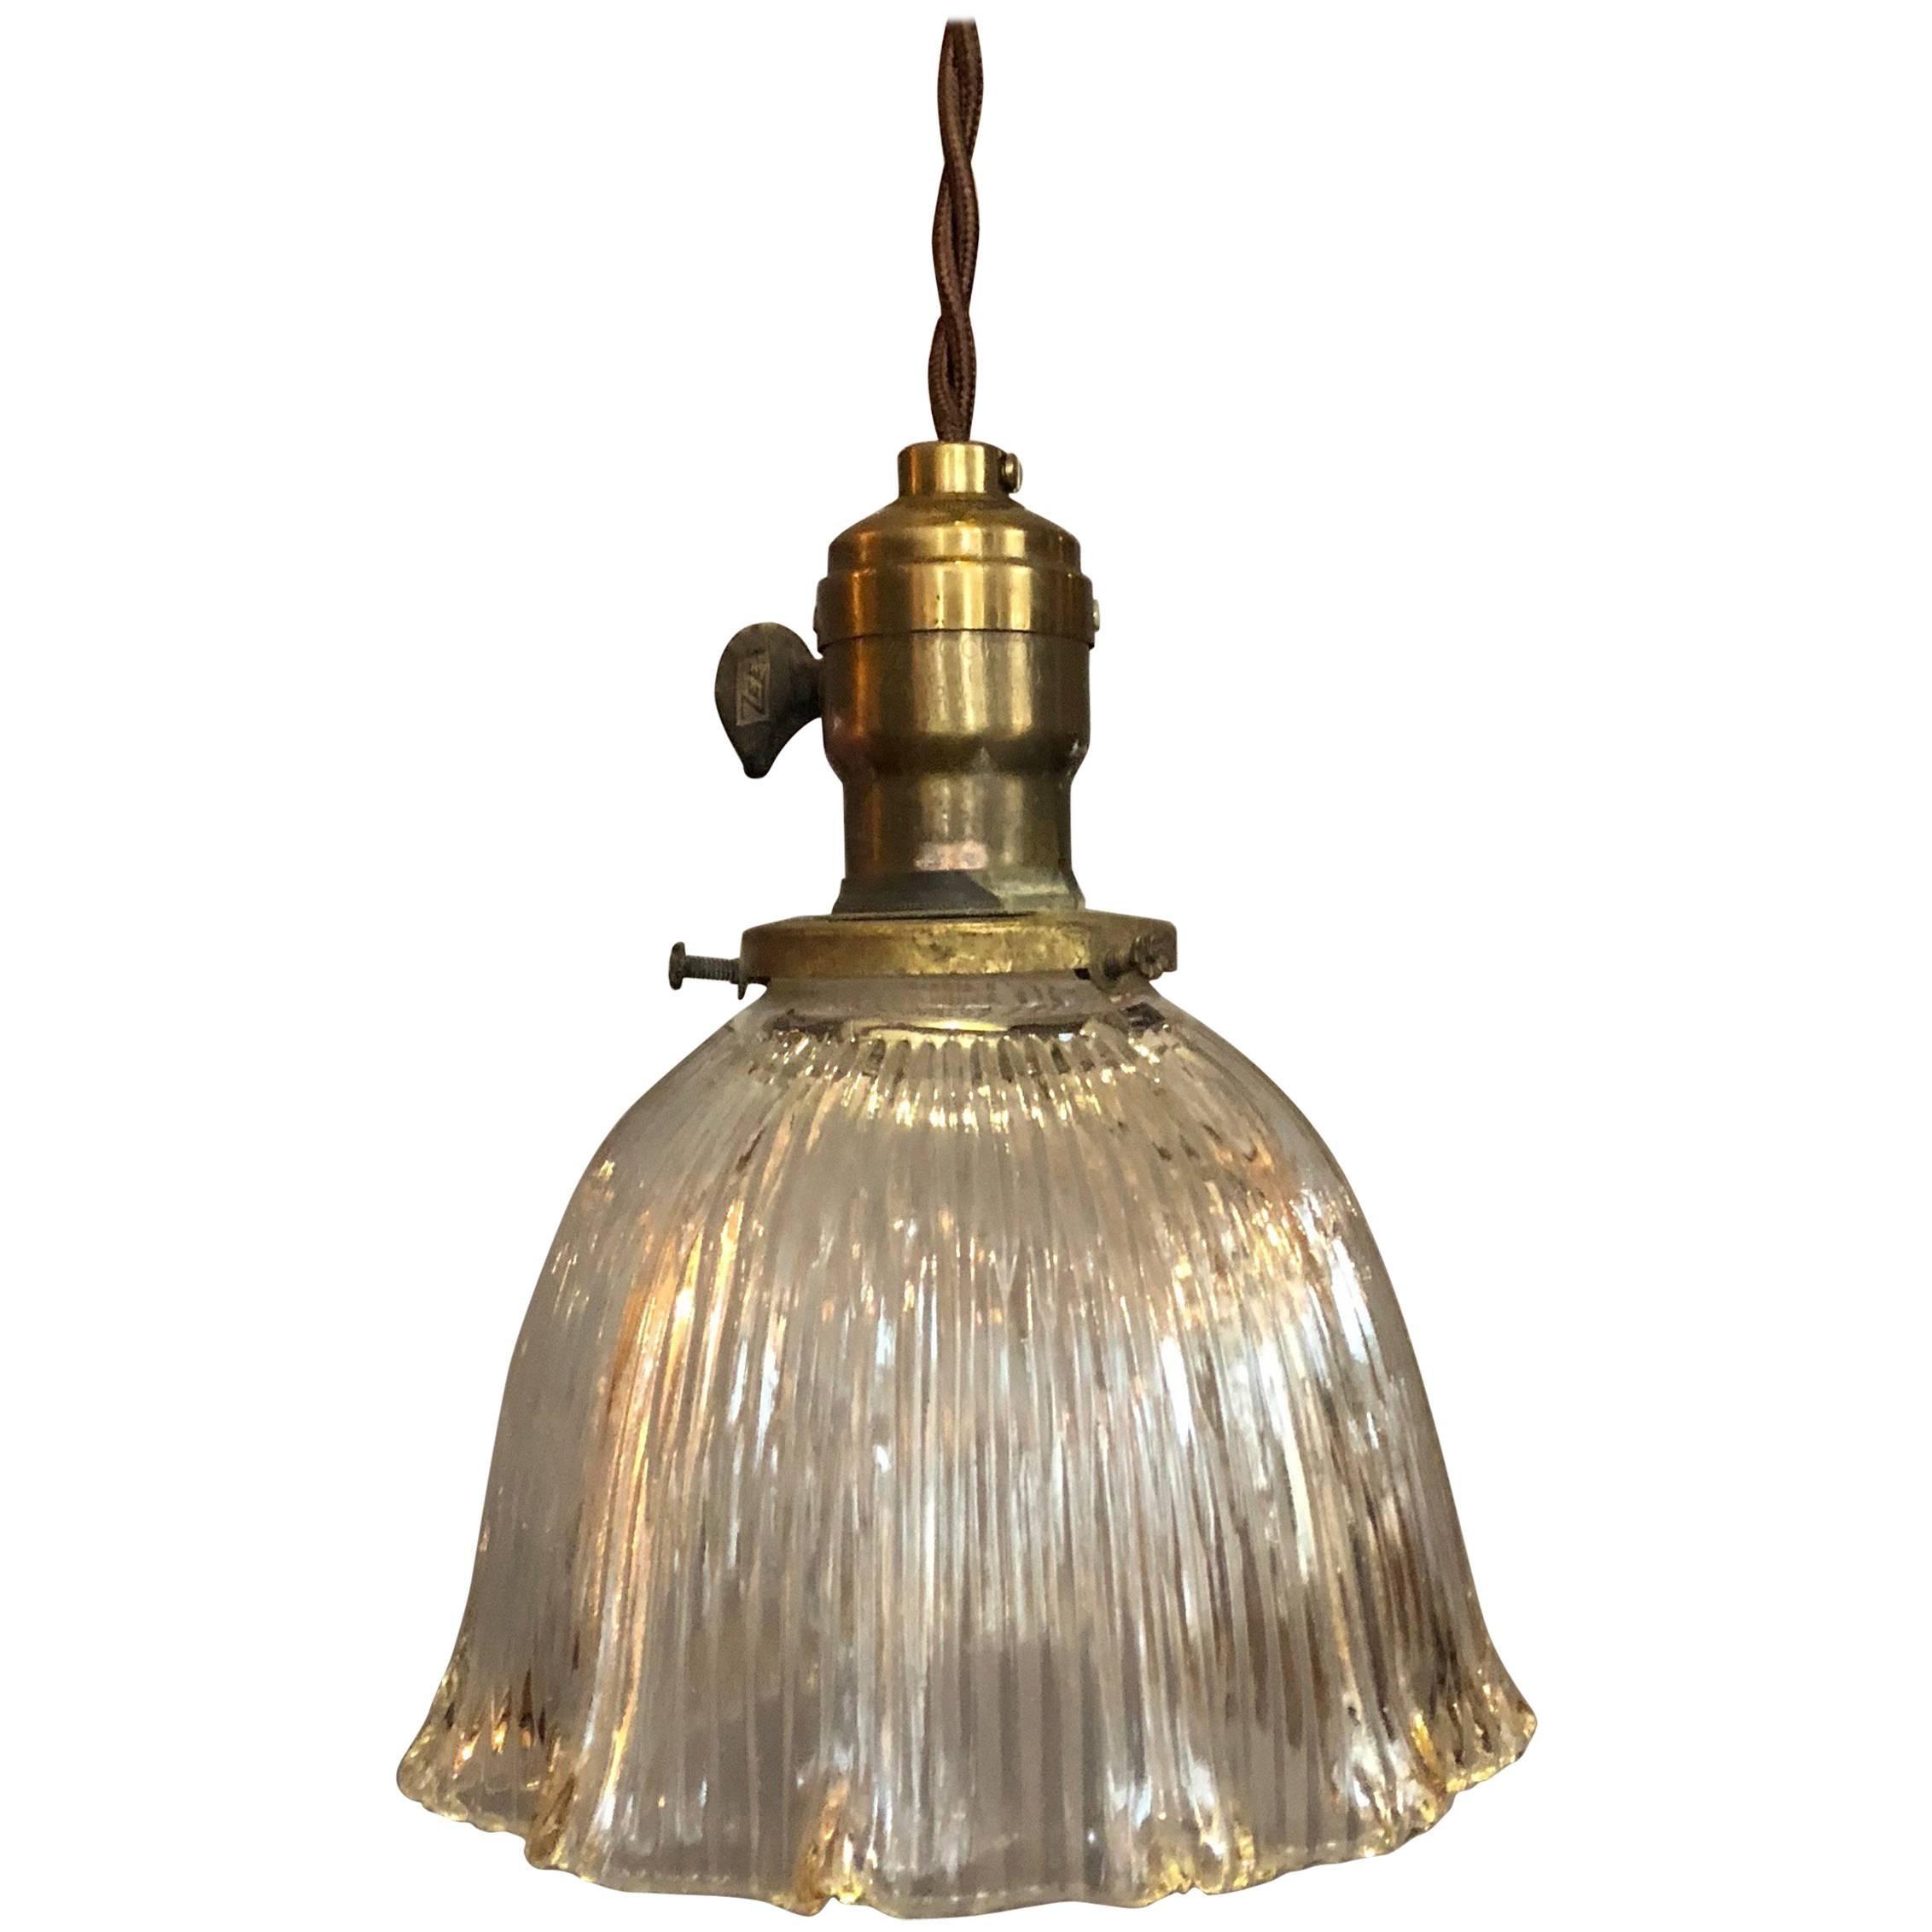 Industrial Scalloped Prismatic Holophane Bell Pendant Light